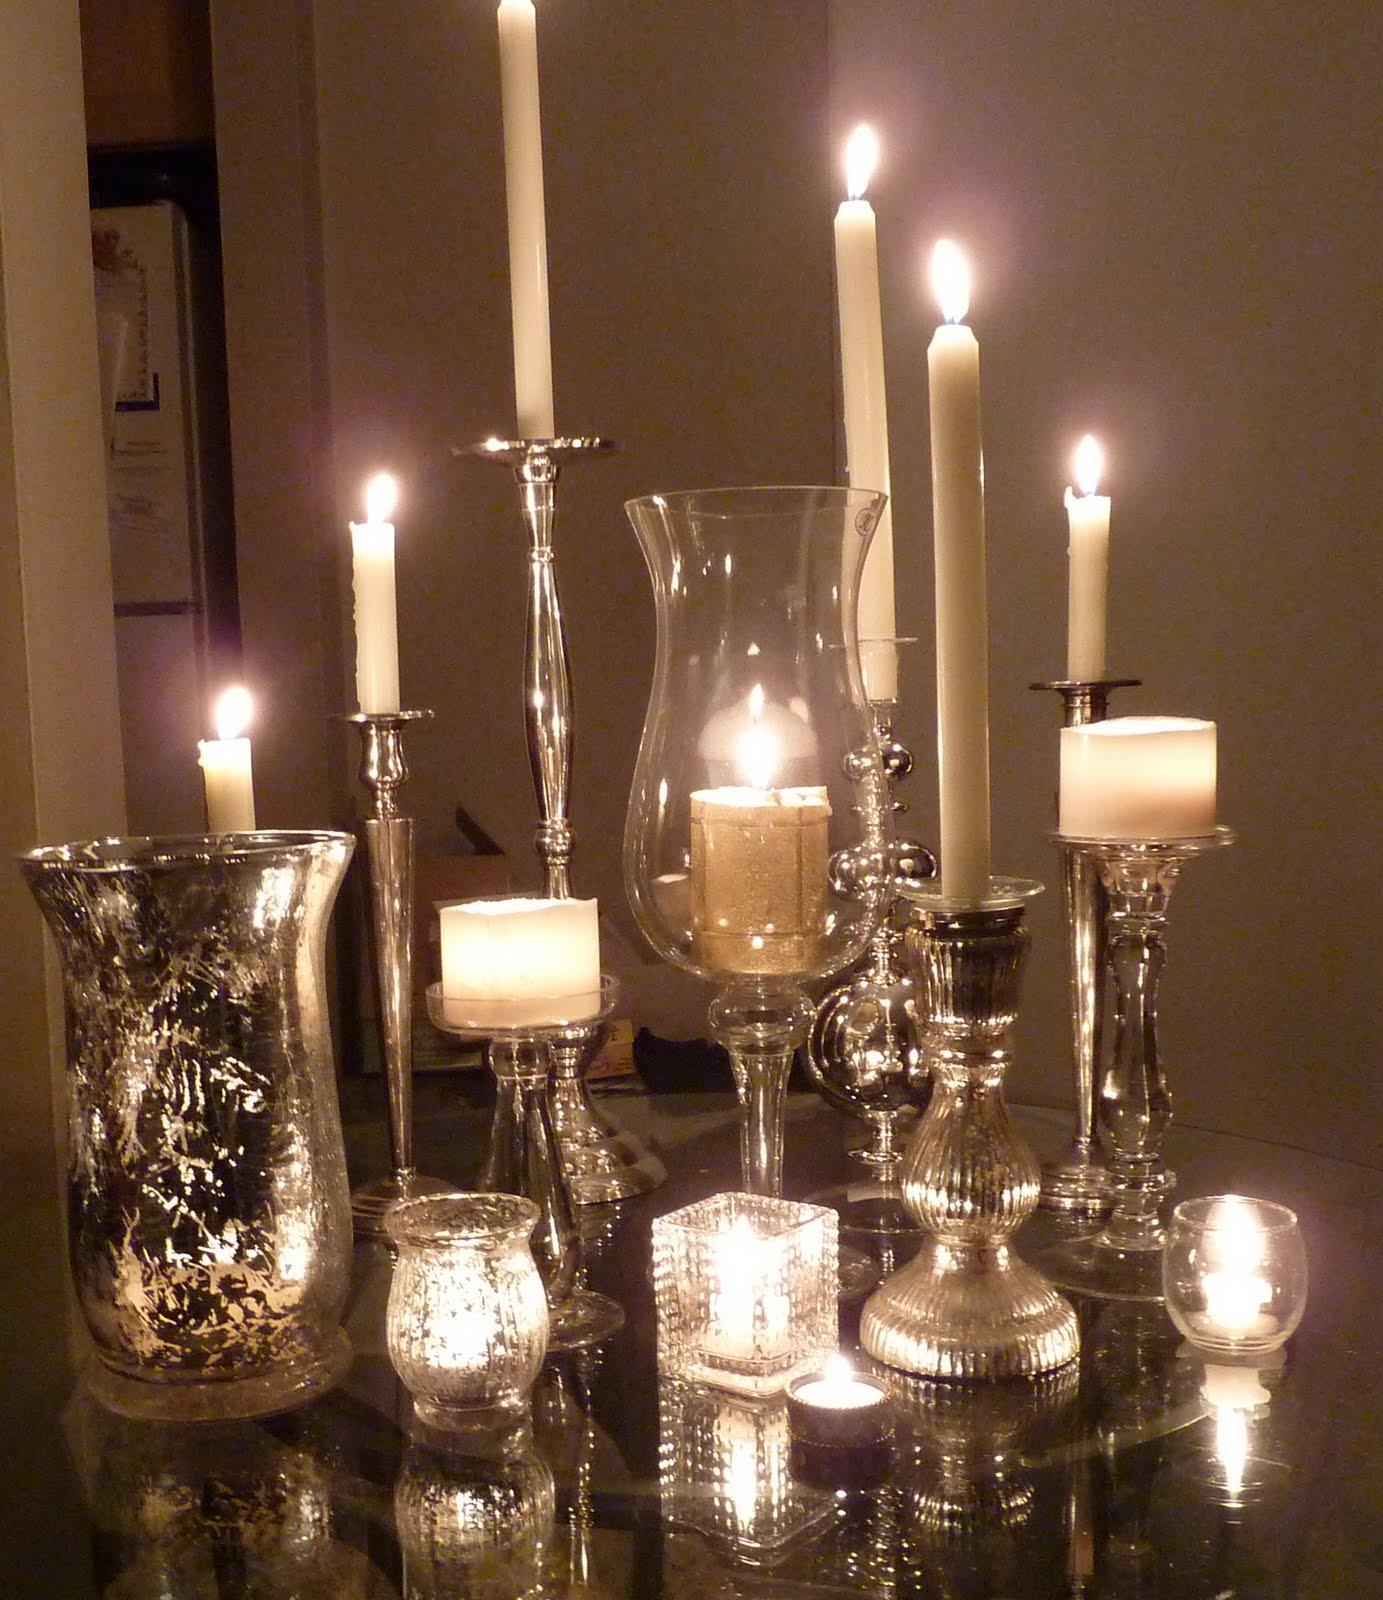 Madeira Linen Collector: Silver + Glass + Candles ==> Make